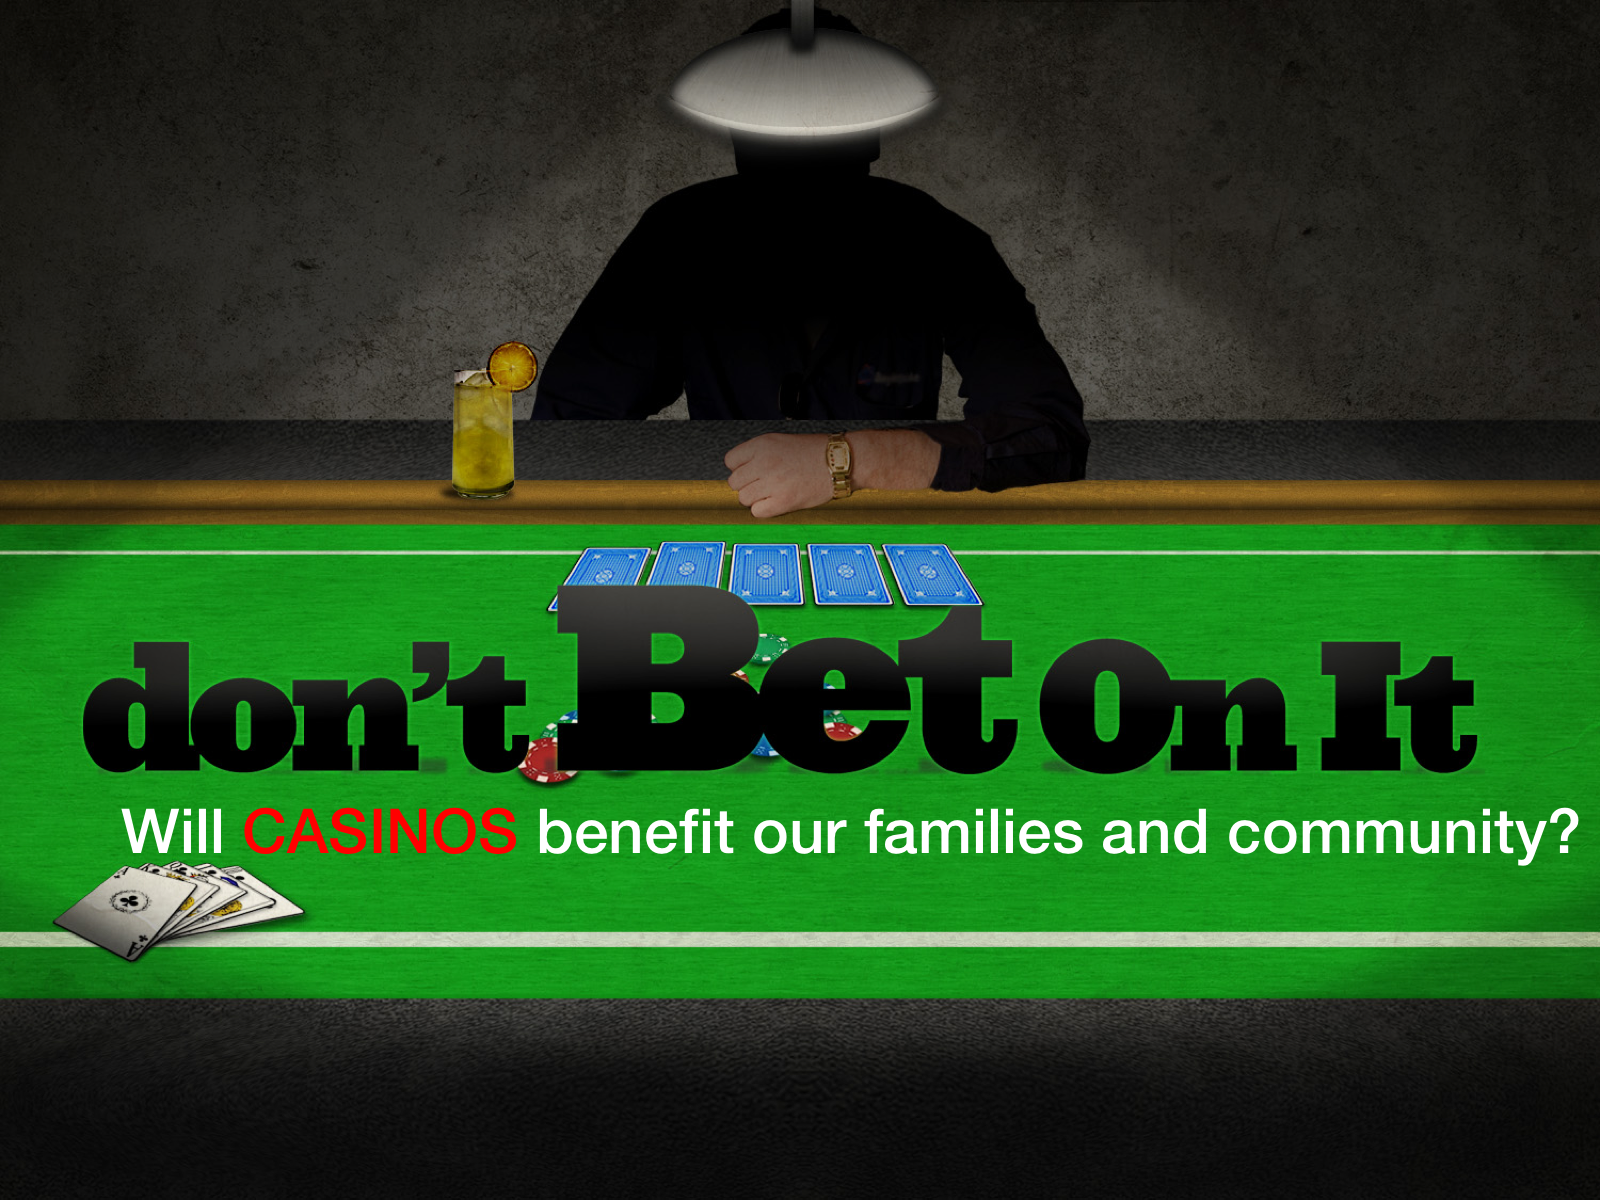 Issue Analysis: Gambling